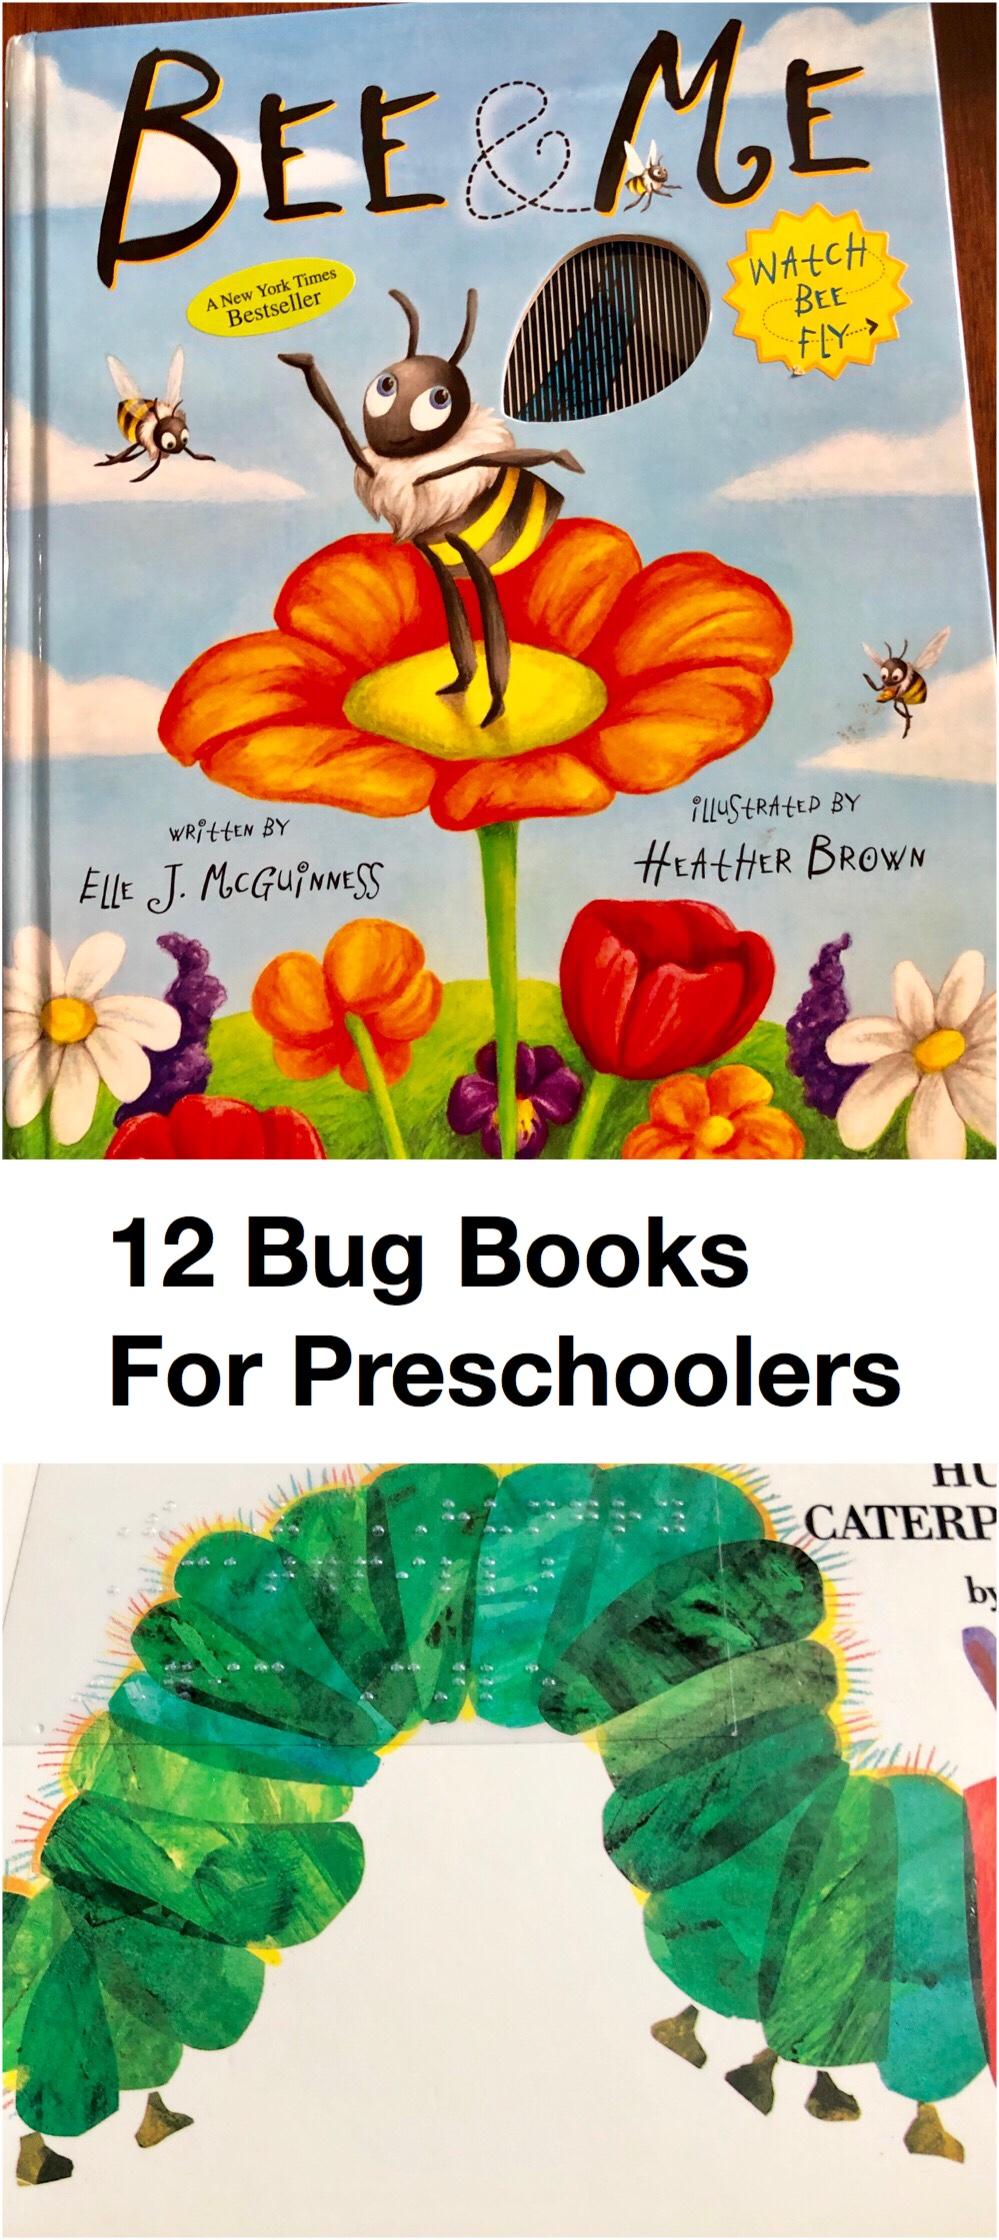 12 Bug Books for Preschoolers pin